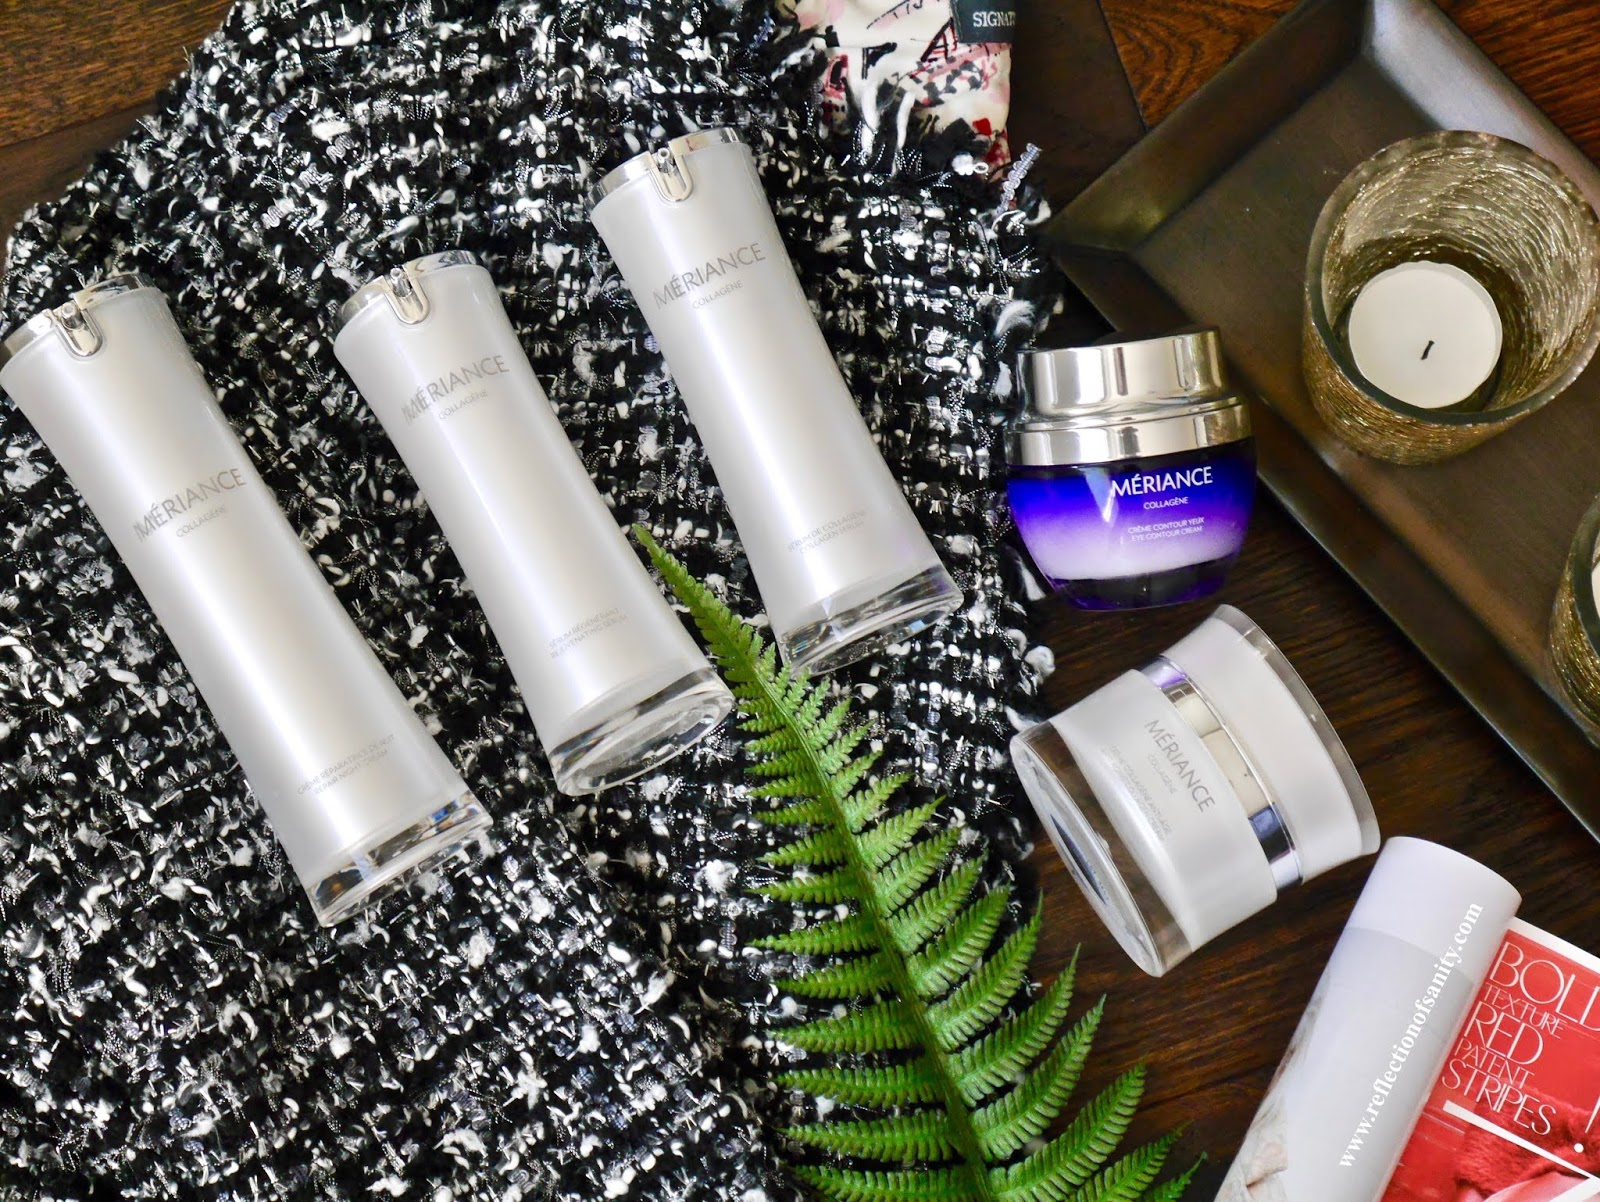 Beauty, day cream, eye cream, moisturiser, night cream, serum, antioxidants, healthy skin, beautiful skin